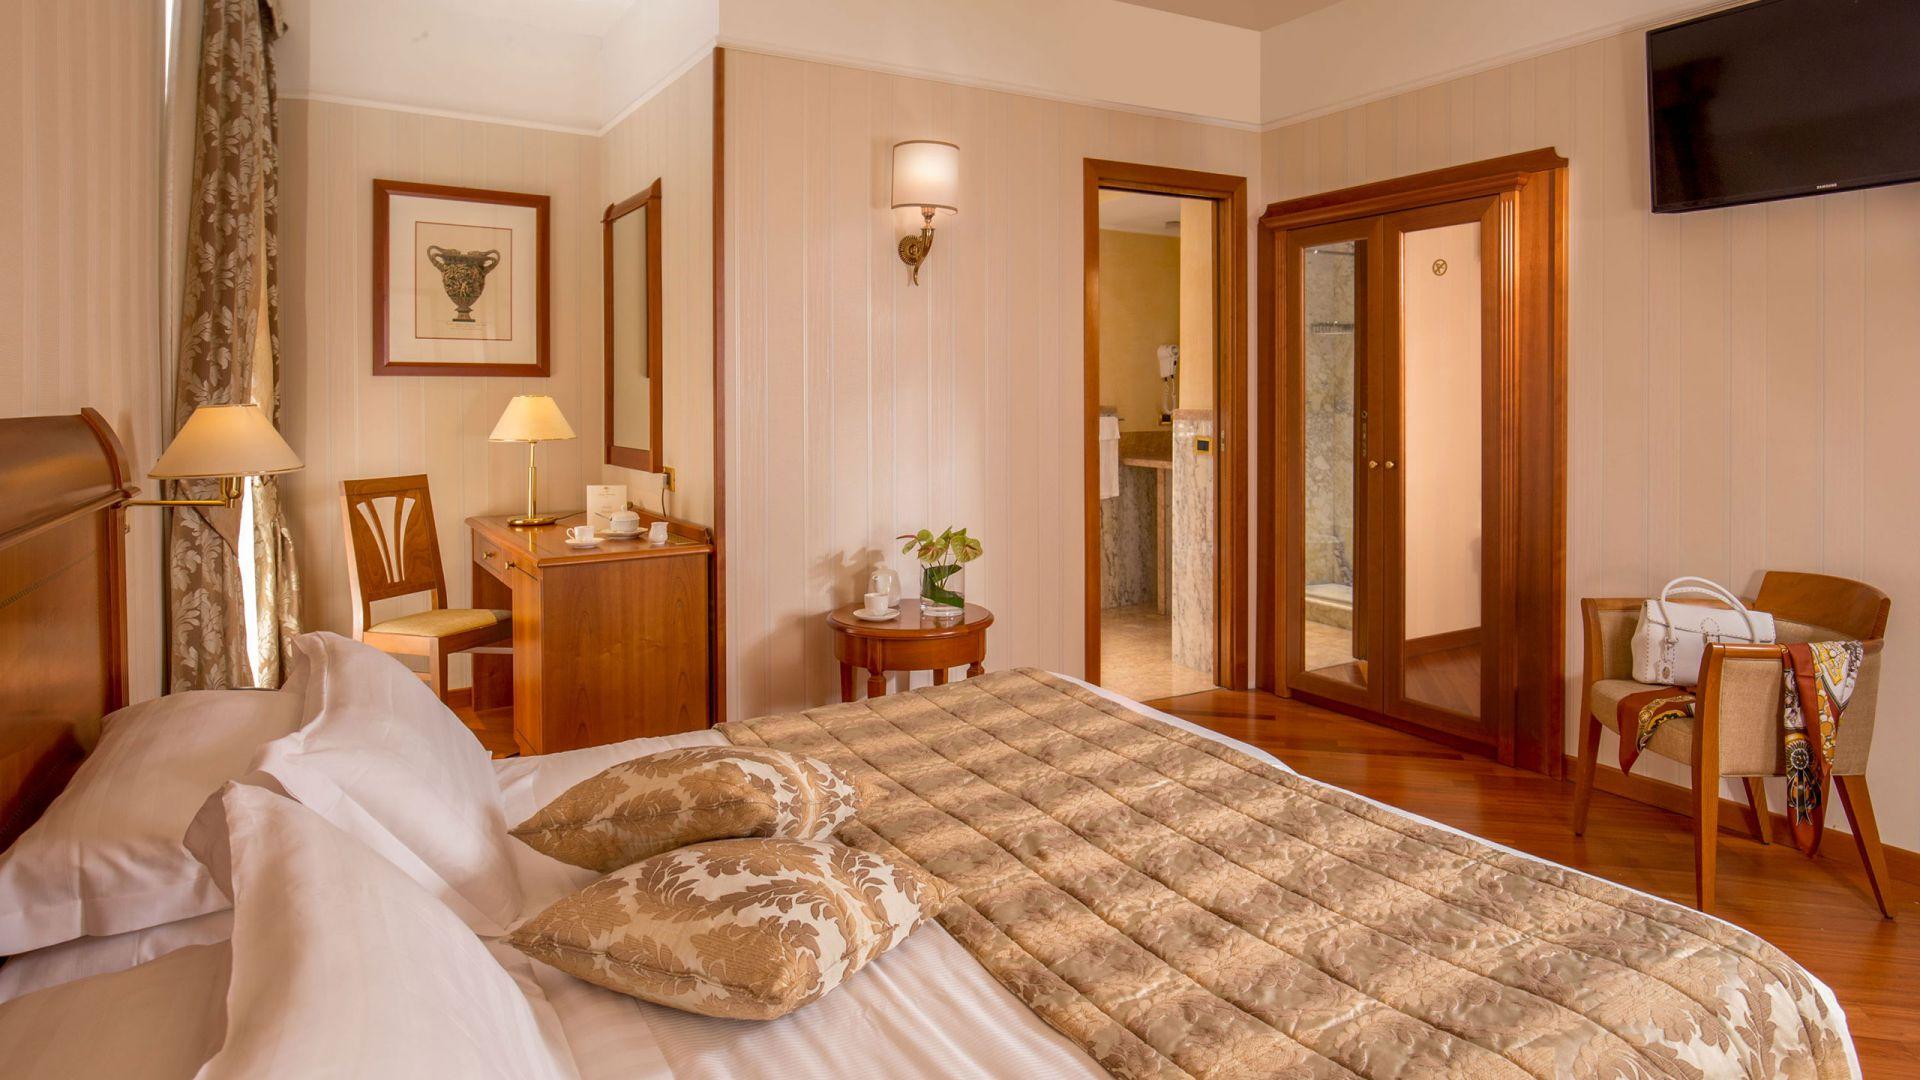 albergo-ottocento-rome-double-room-deluxe-04